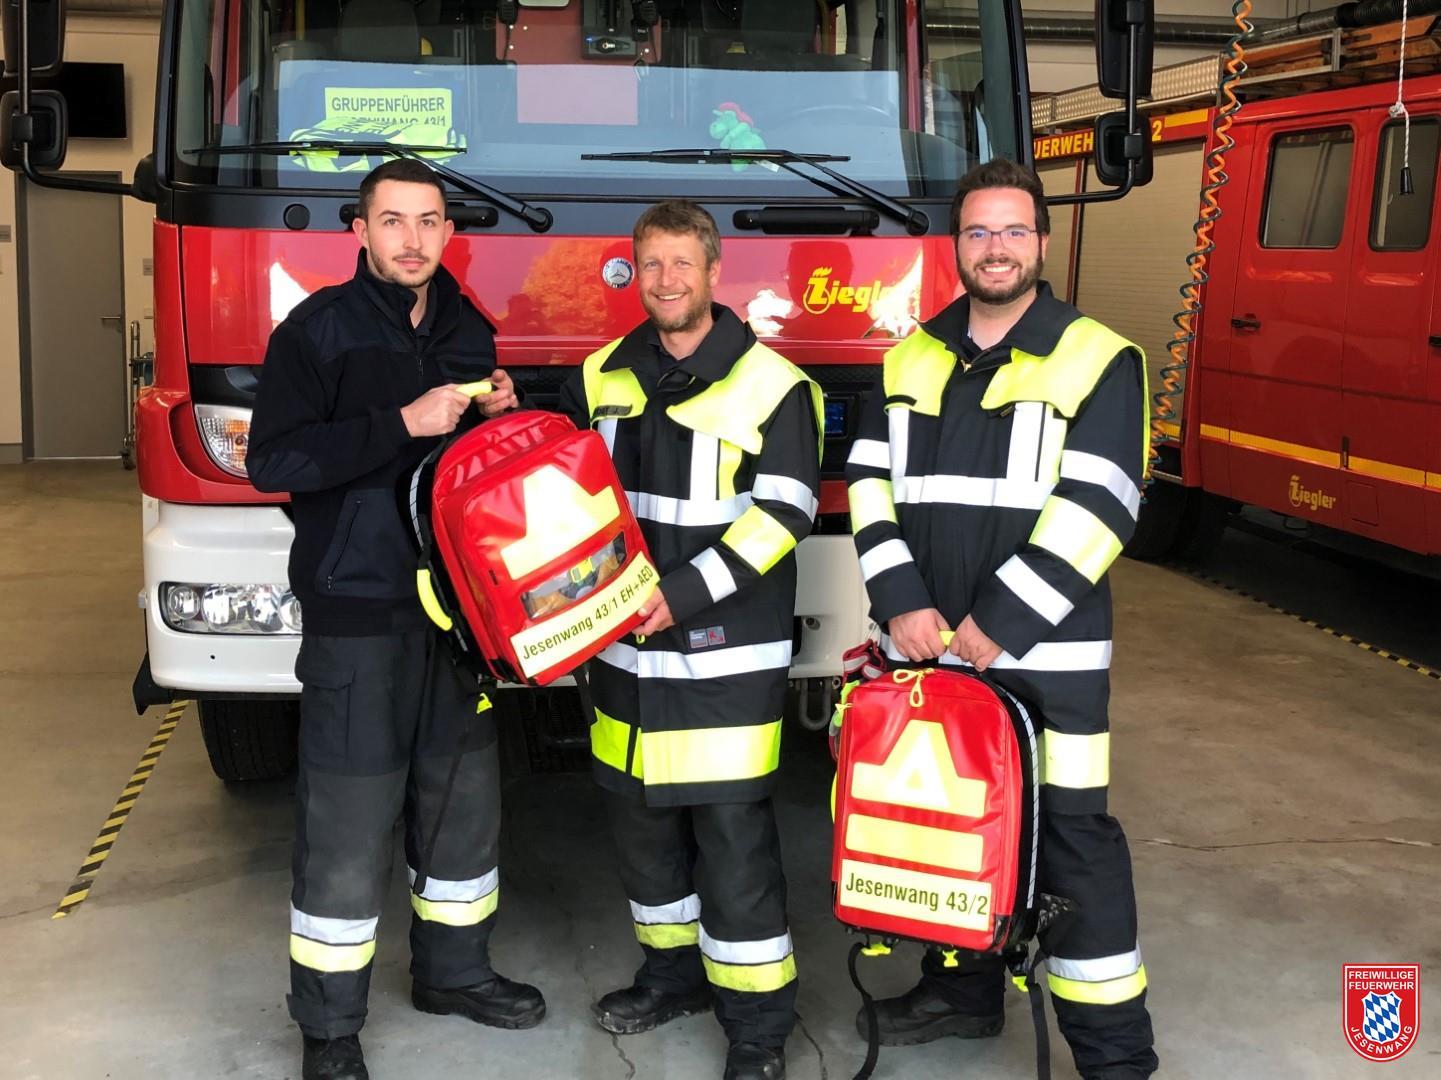 v.l.n.r: Florian Peschke (Knorr-Bremse Projektpate), Jürgen Vogt (Kommandant) und Anton Herele jun. (Stellvertretender Kommandant)